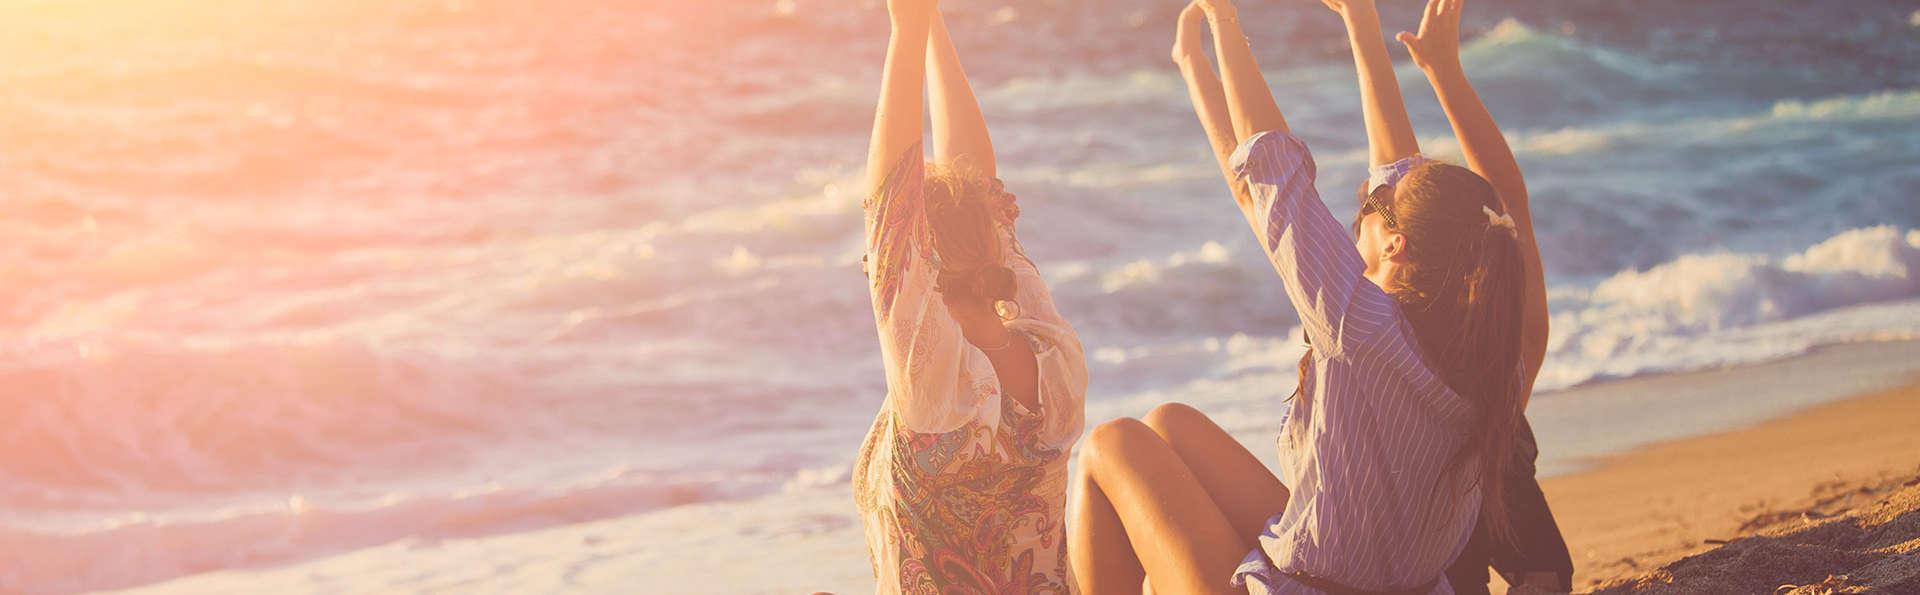 Hotel Balneario Playa de Comarruga - EDIT_FRIENDS_20.jpg